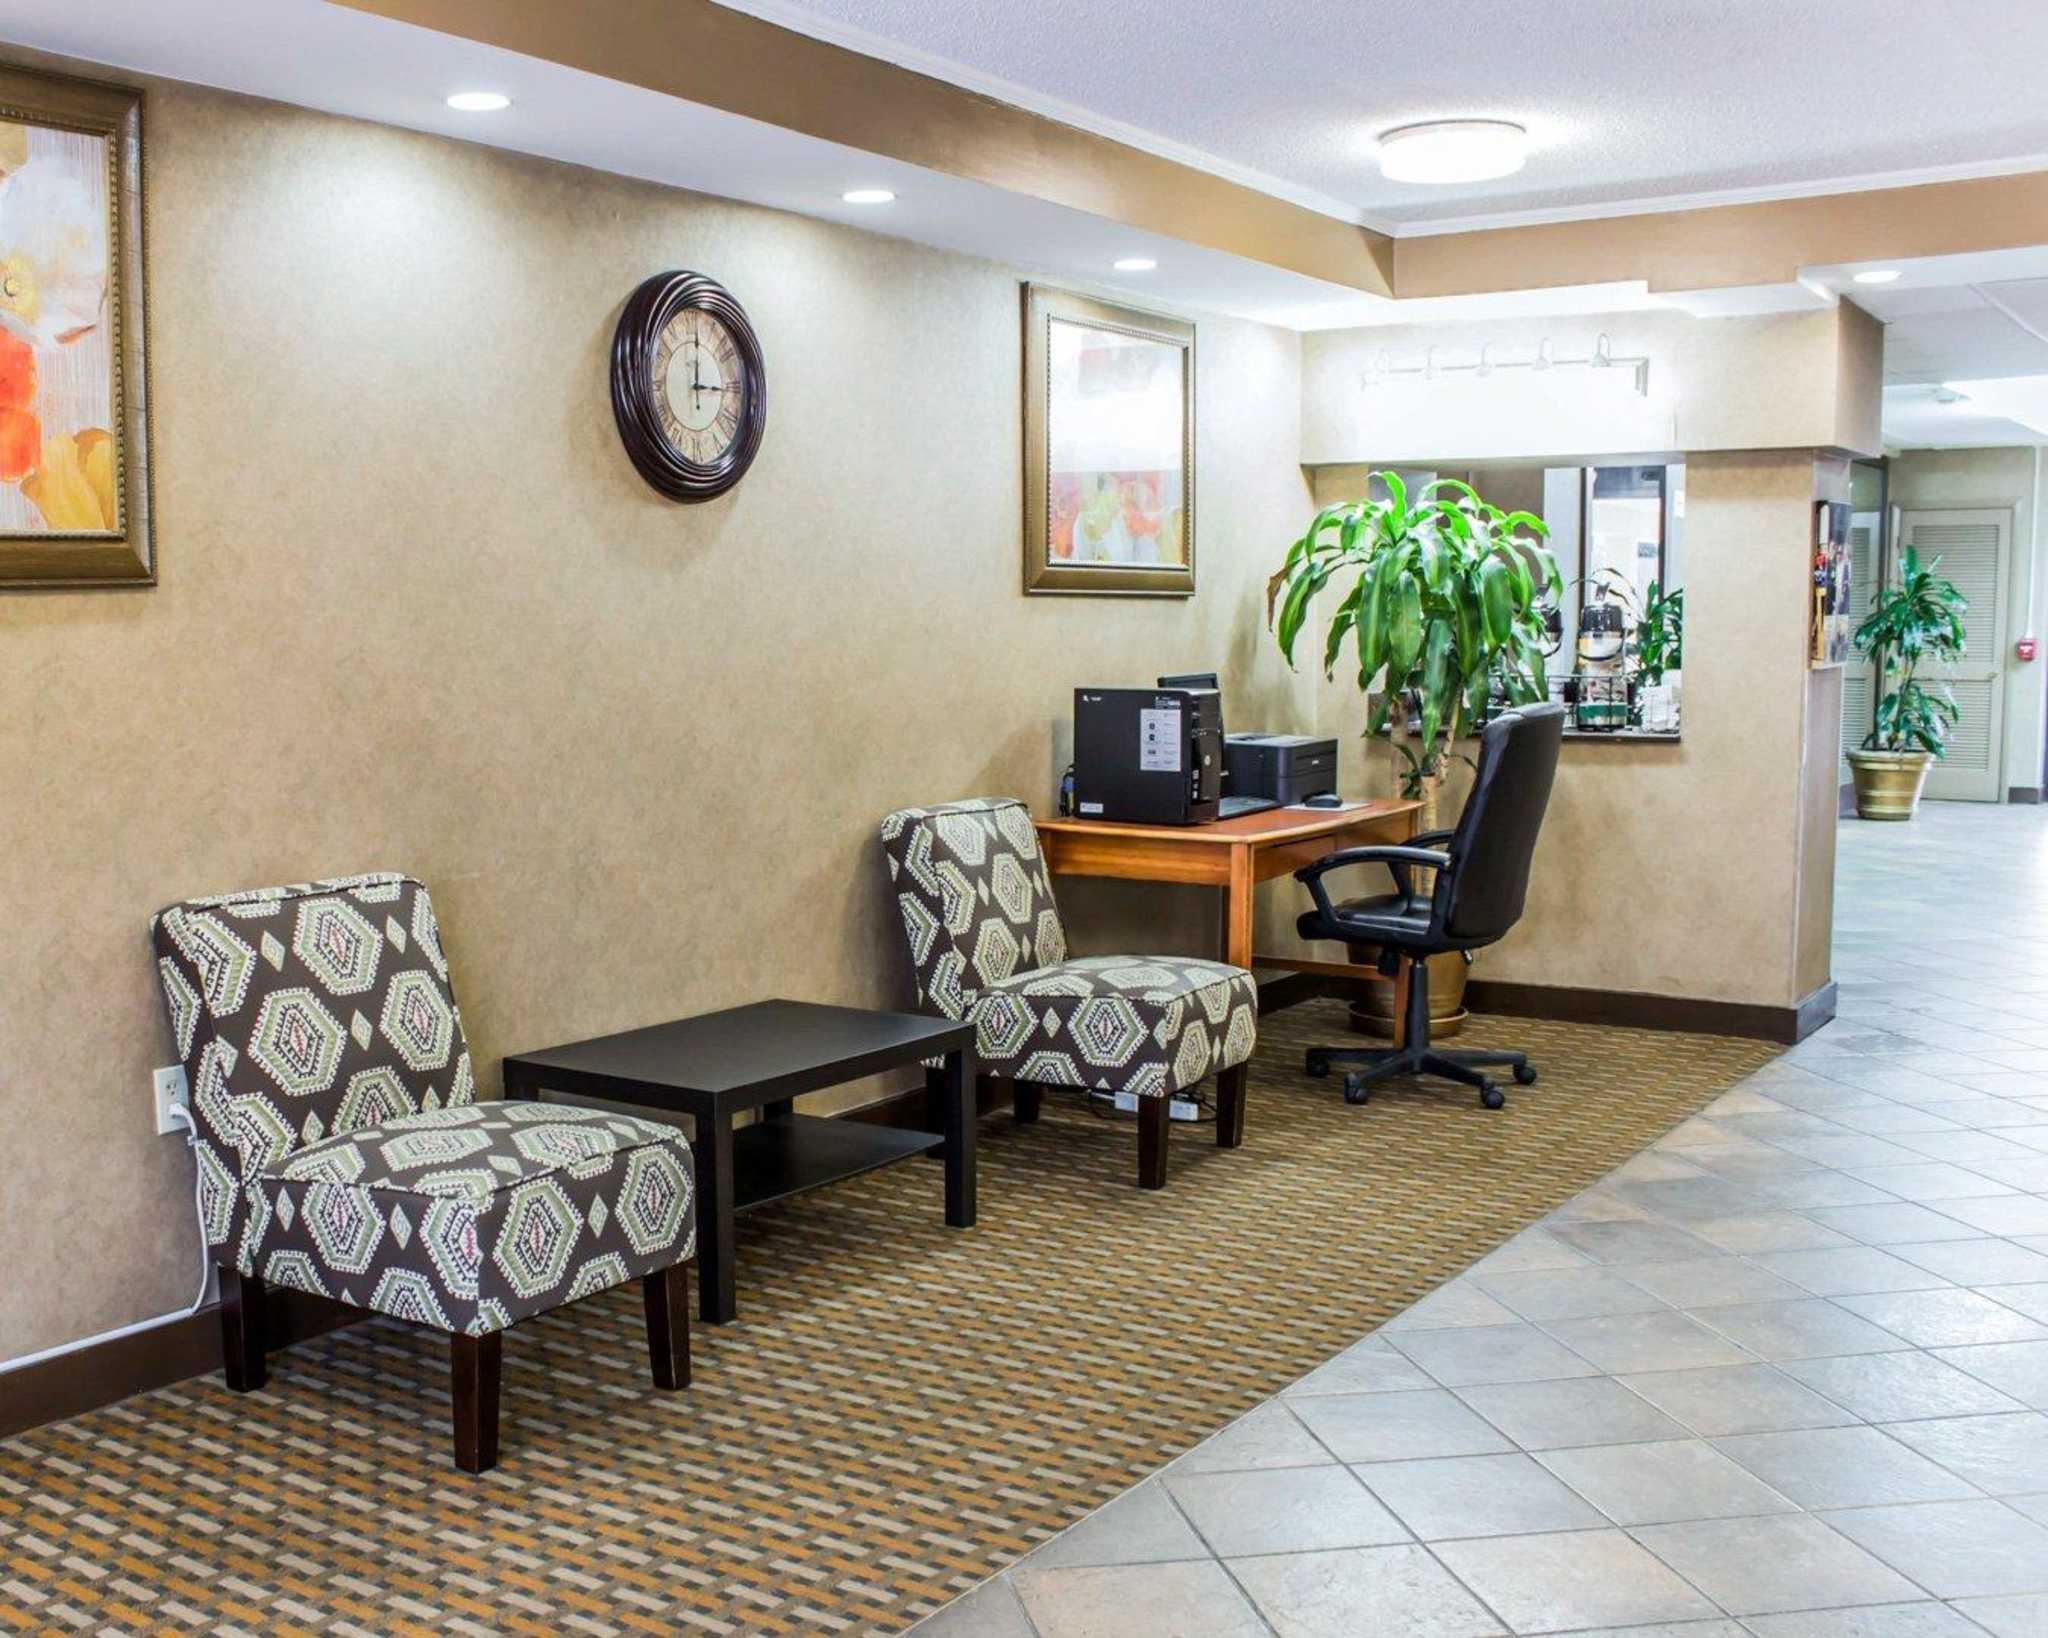 Quality Inn & Suites Fort Bragg image 12